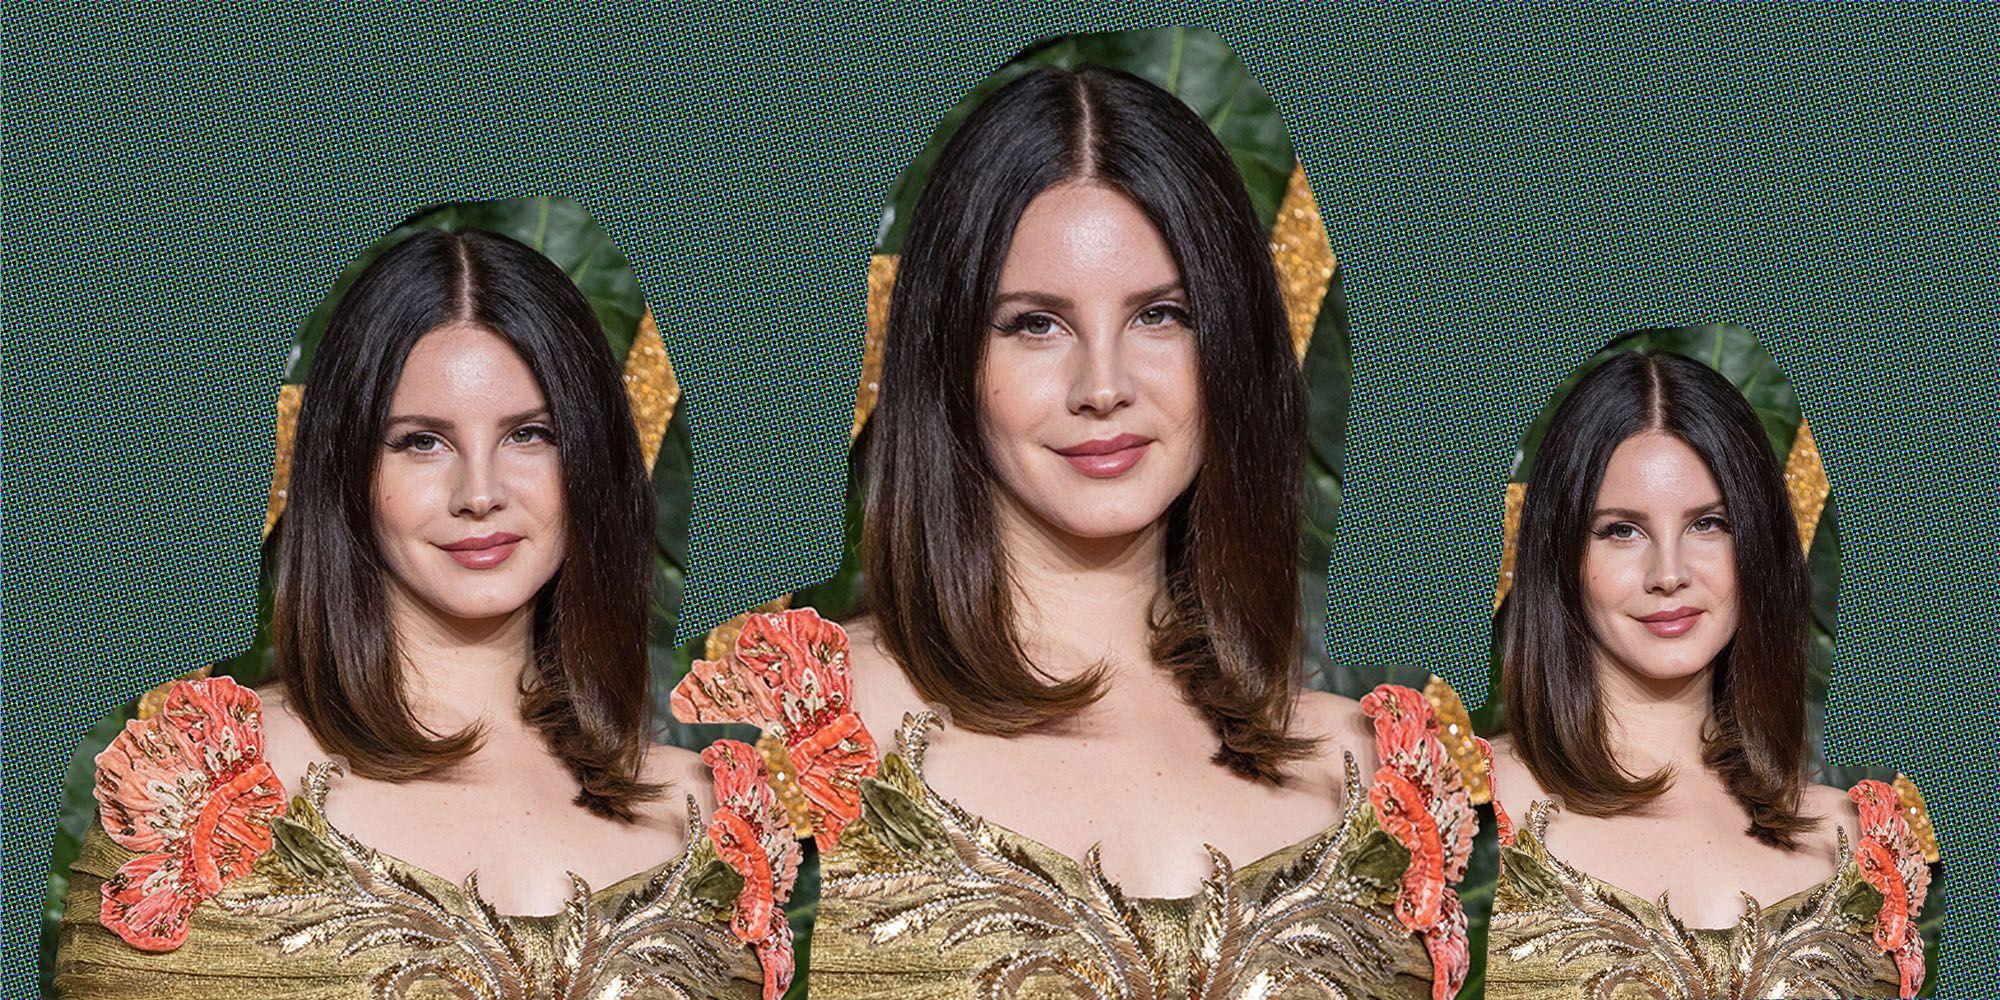 Lana del Rey vlogger